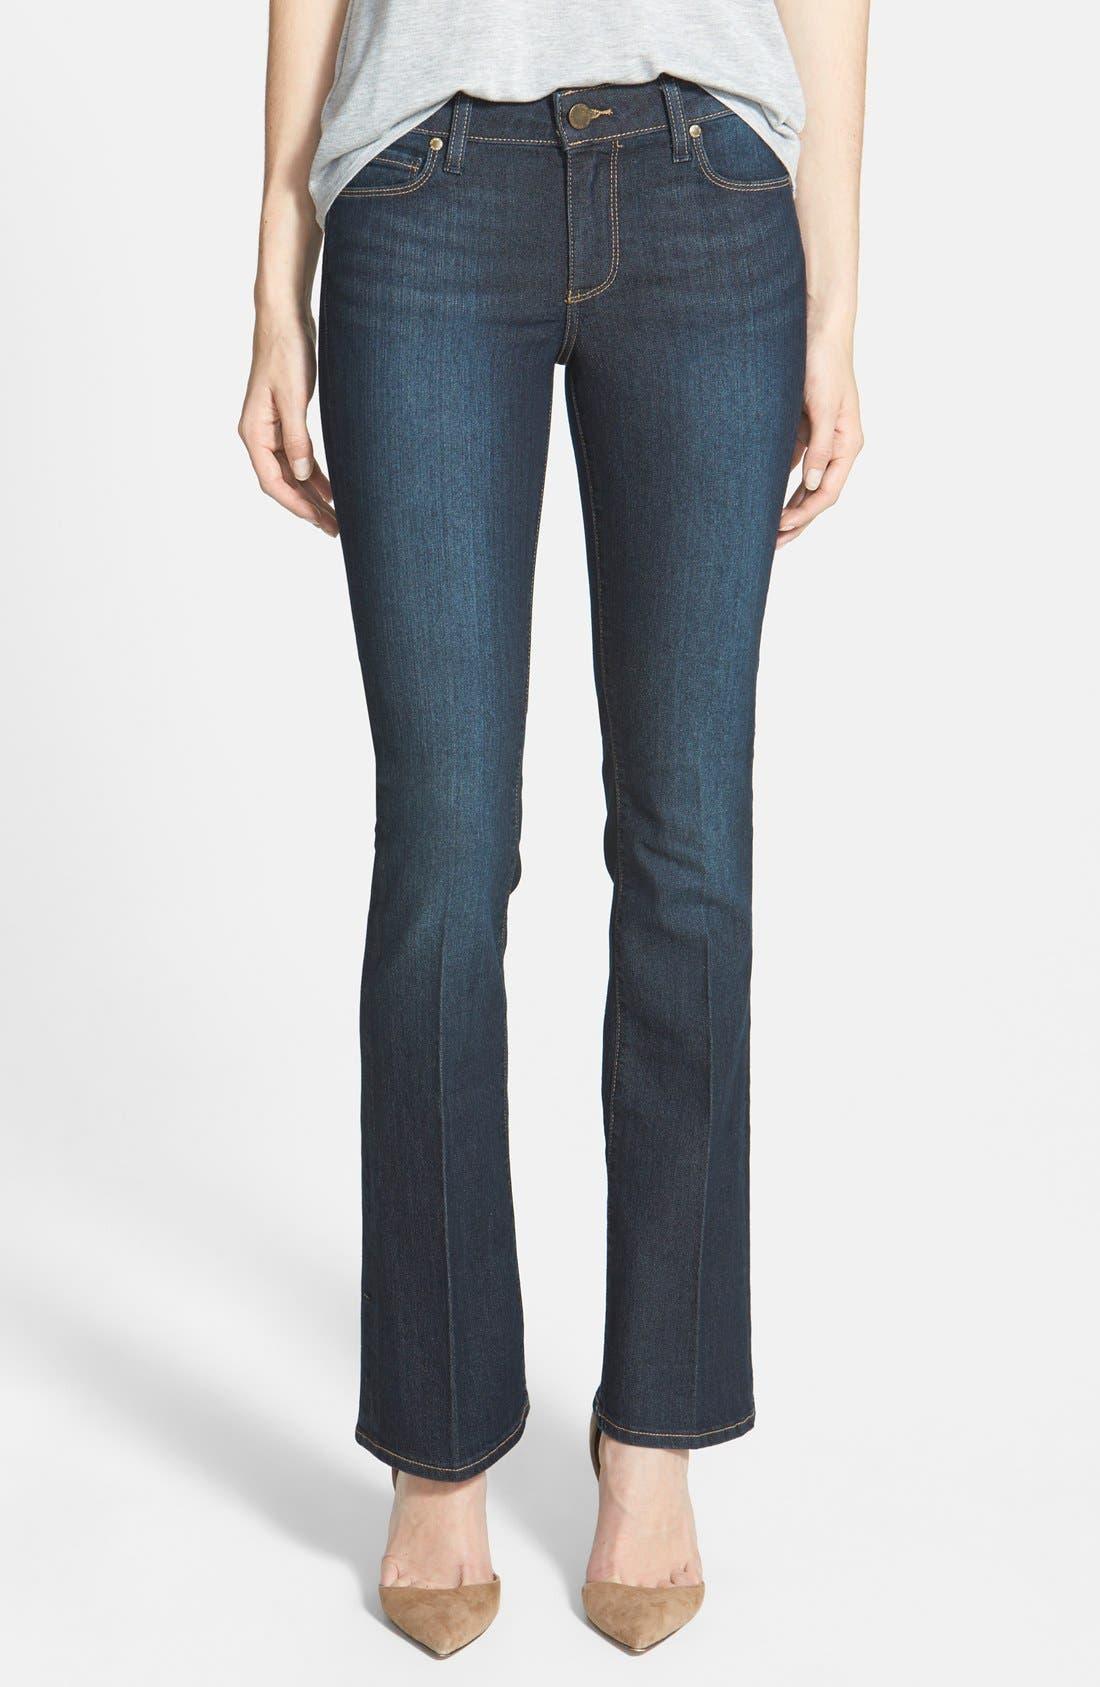 Alternate Image 1 Selected - Paige Denim 'Manhattan' Bootcut Jeans (Moonrise)